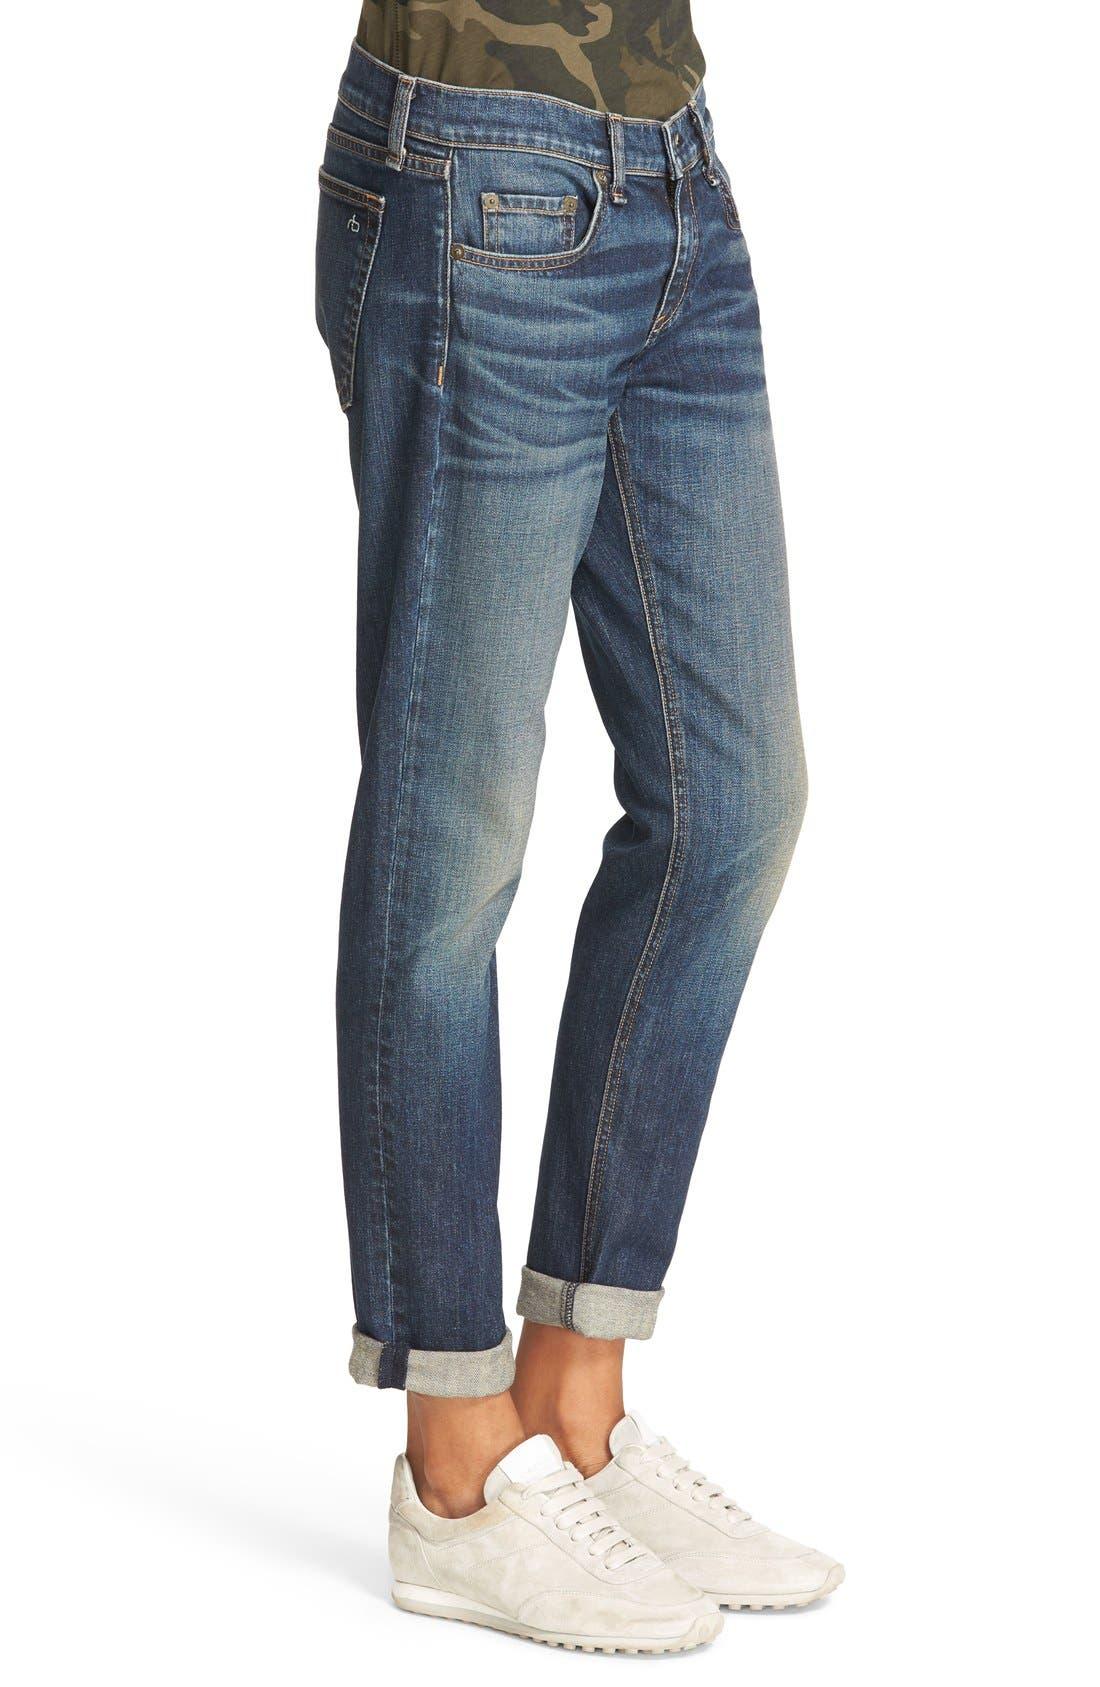 Alternate Image 3  - rag & bone/JEAN The Dre Slim Boyfriend Jeans (Mission)